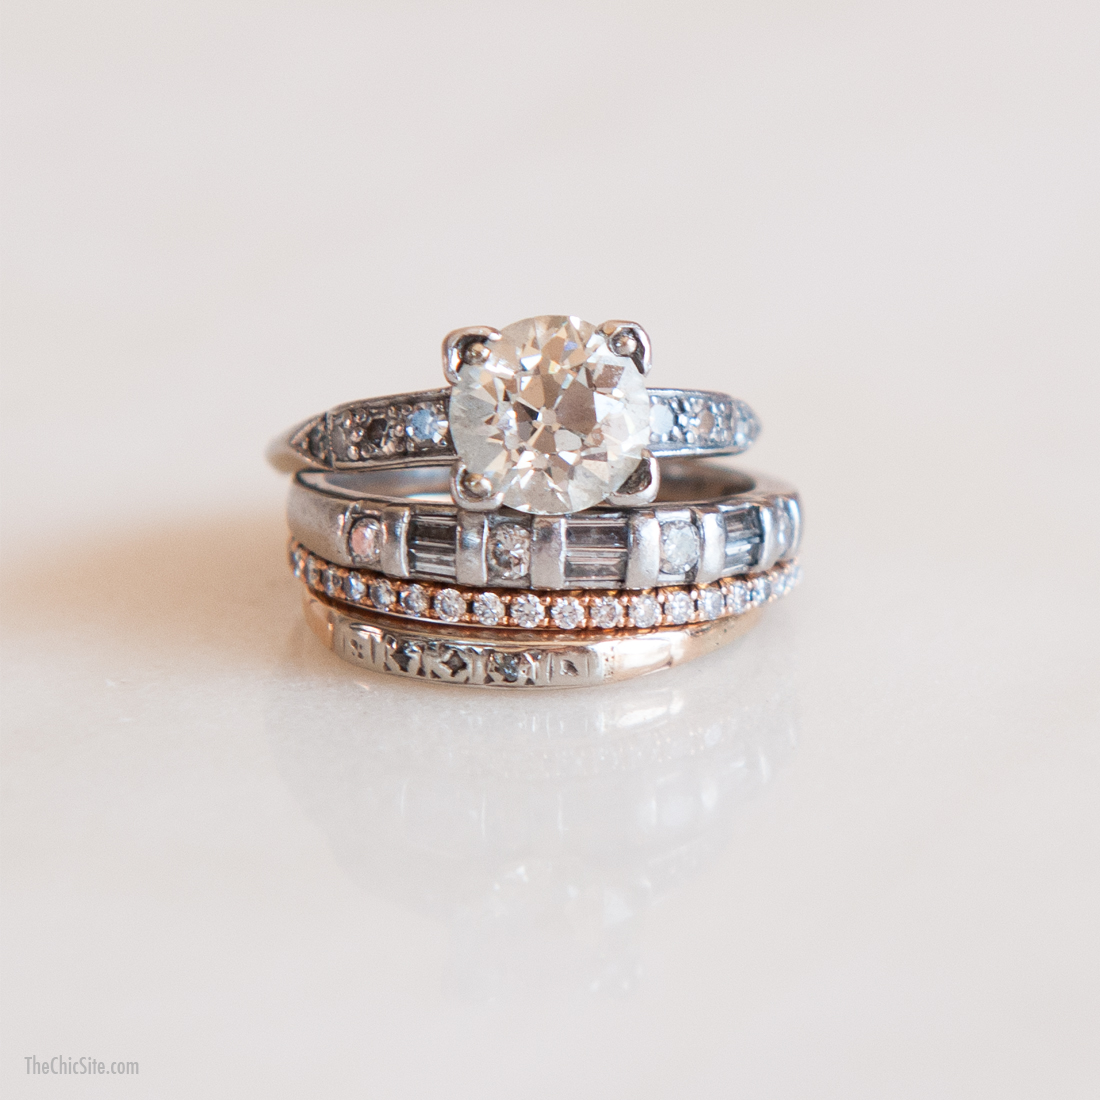 stackable wedding rings stacked wedding rings set Stackable wedding rings Rachel Hollis Stacked Wedding Rings